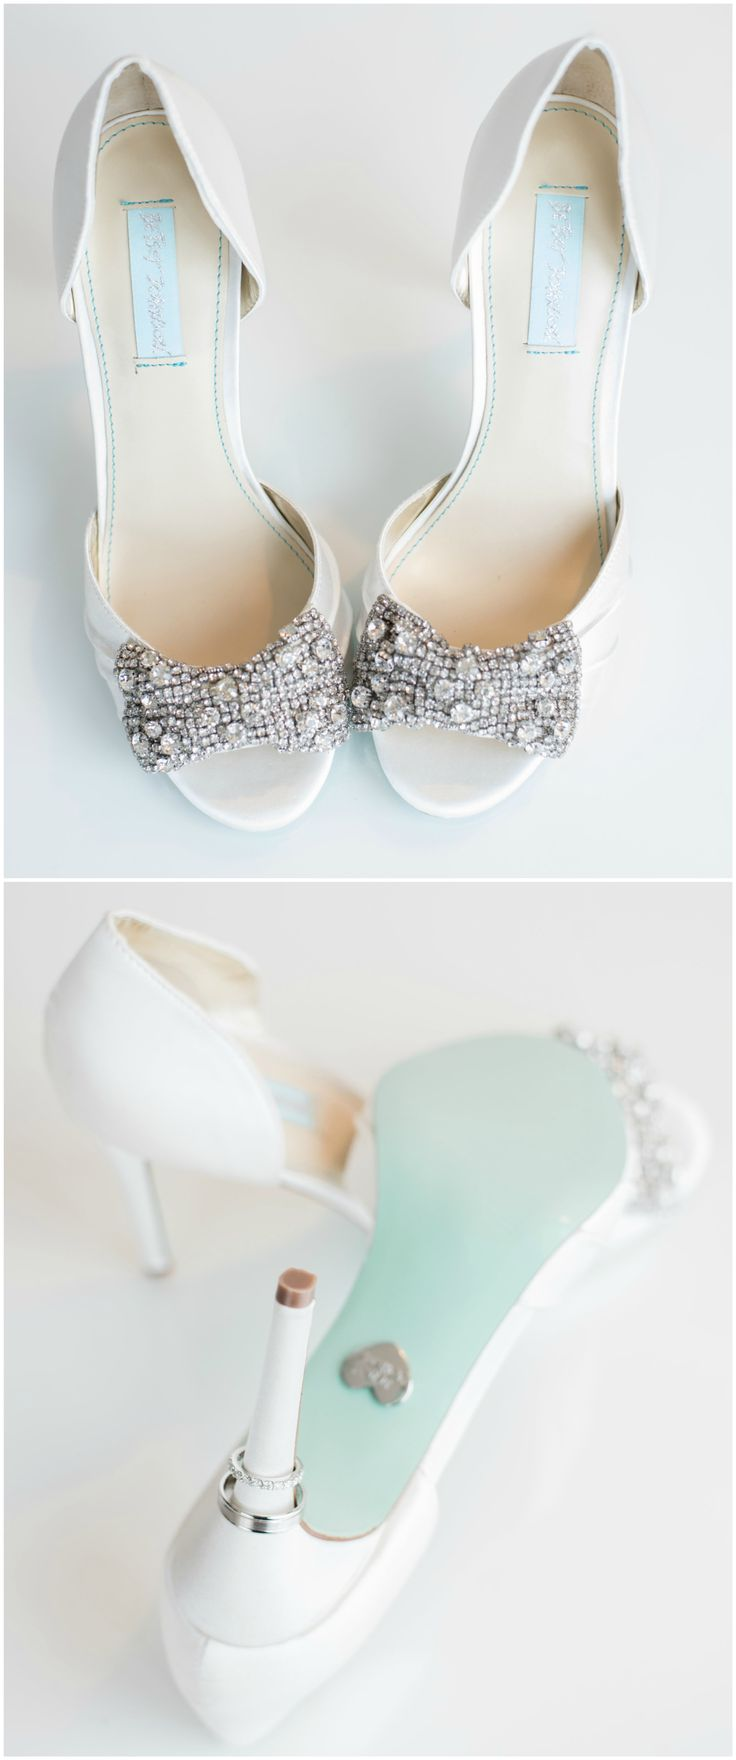 wedding shoes betsey johnson wedding shoes Betsey Johnson heels bedazzled bow turquoise sole wedding shoes Rowan Wells